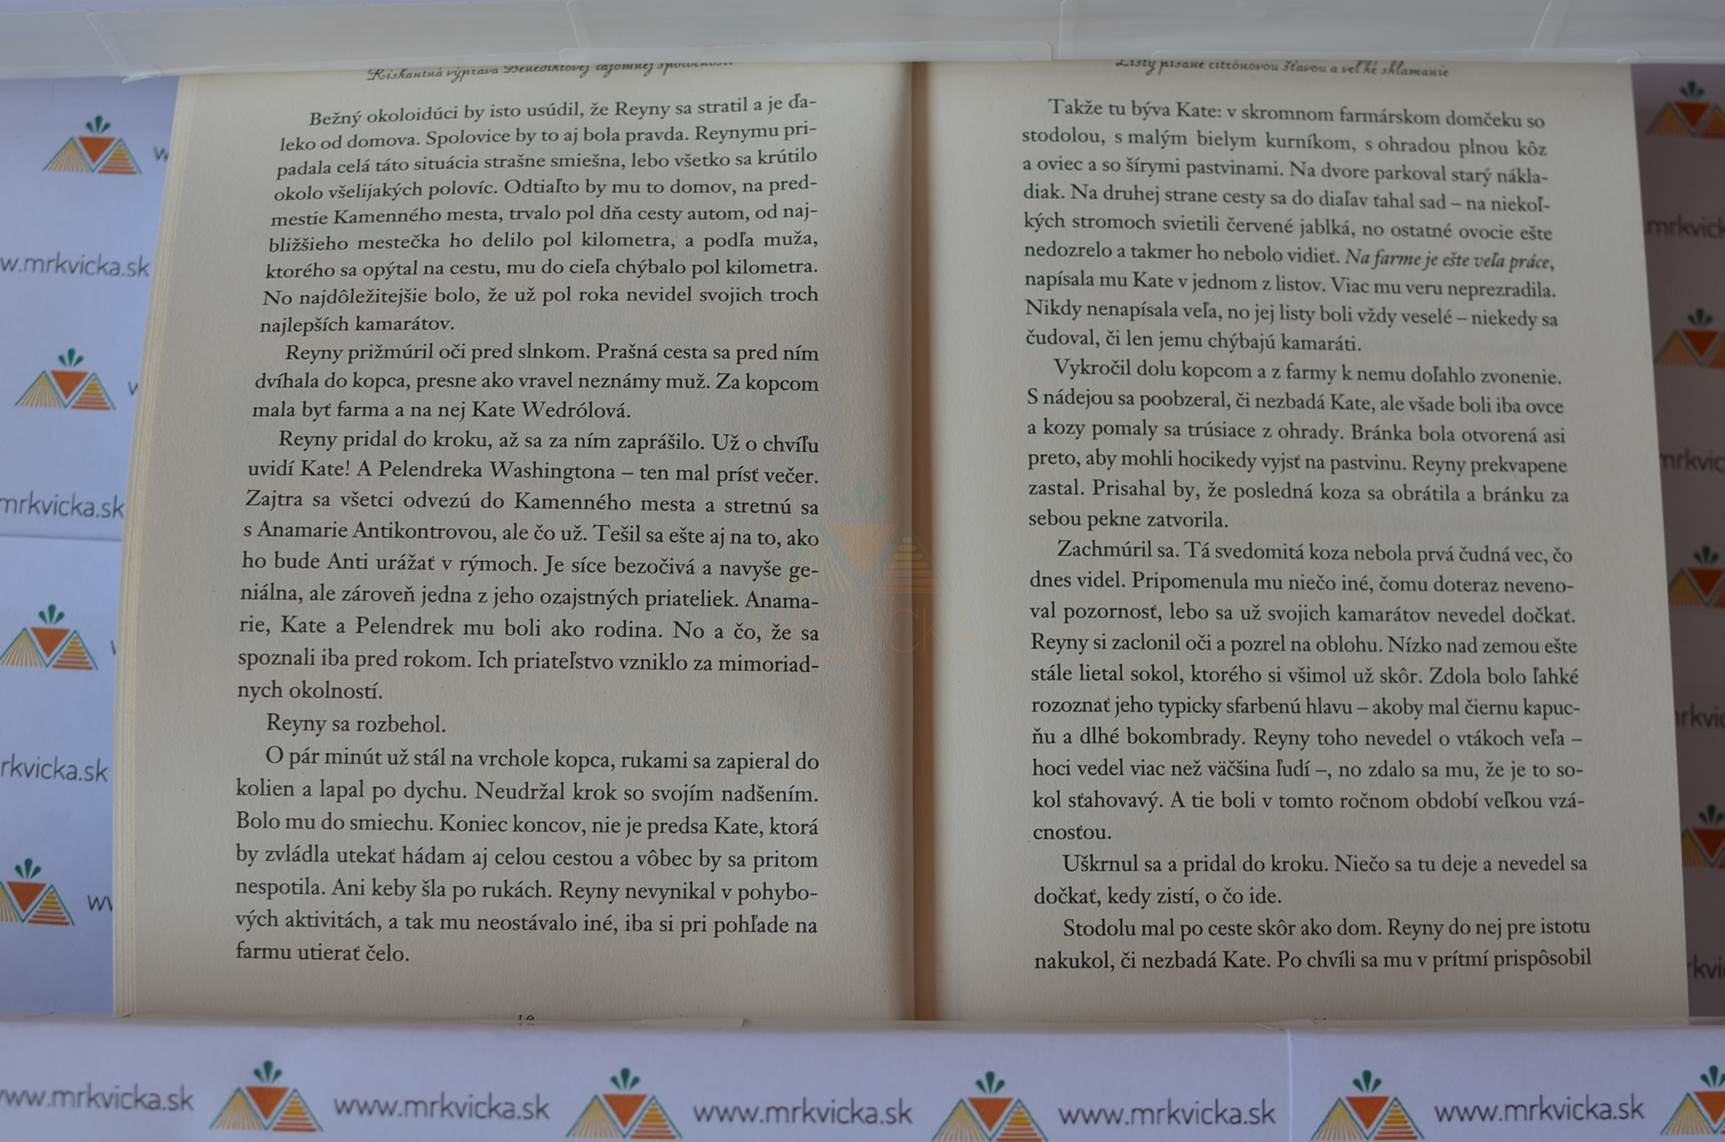 Benediktova Taj. Spol. 2 - Riskantná výprava Benediktovej tajomnej spoločnosti